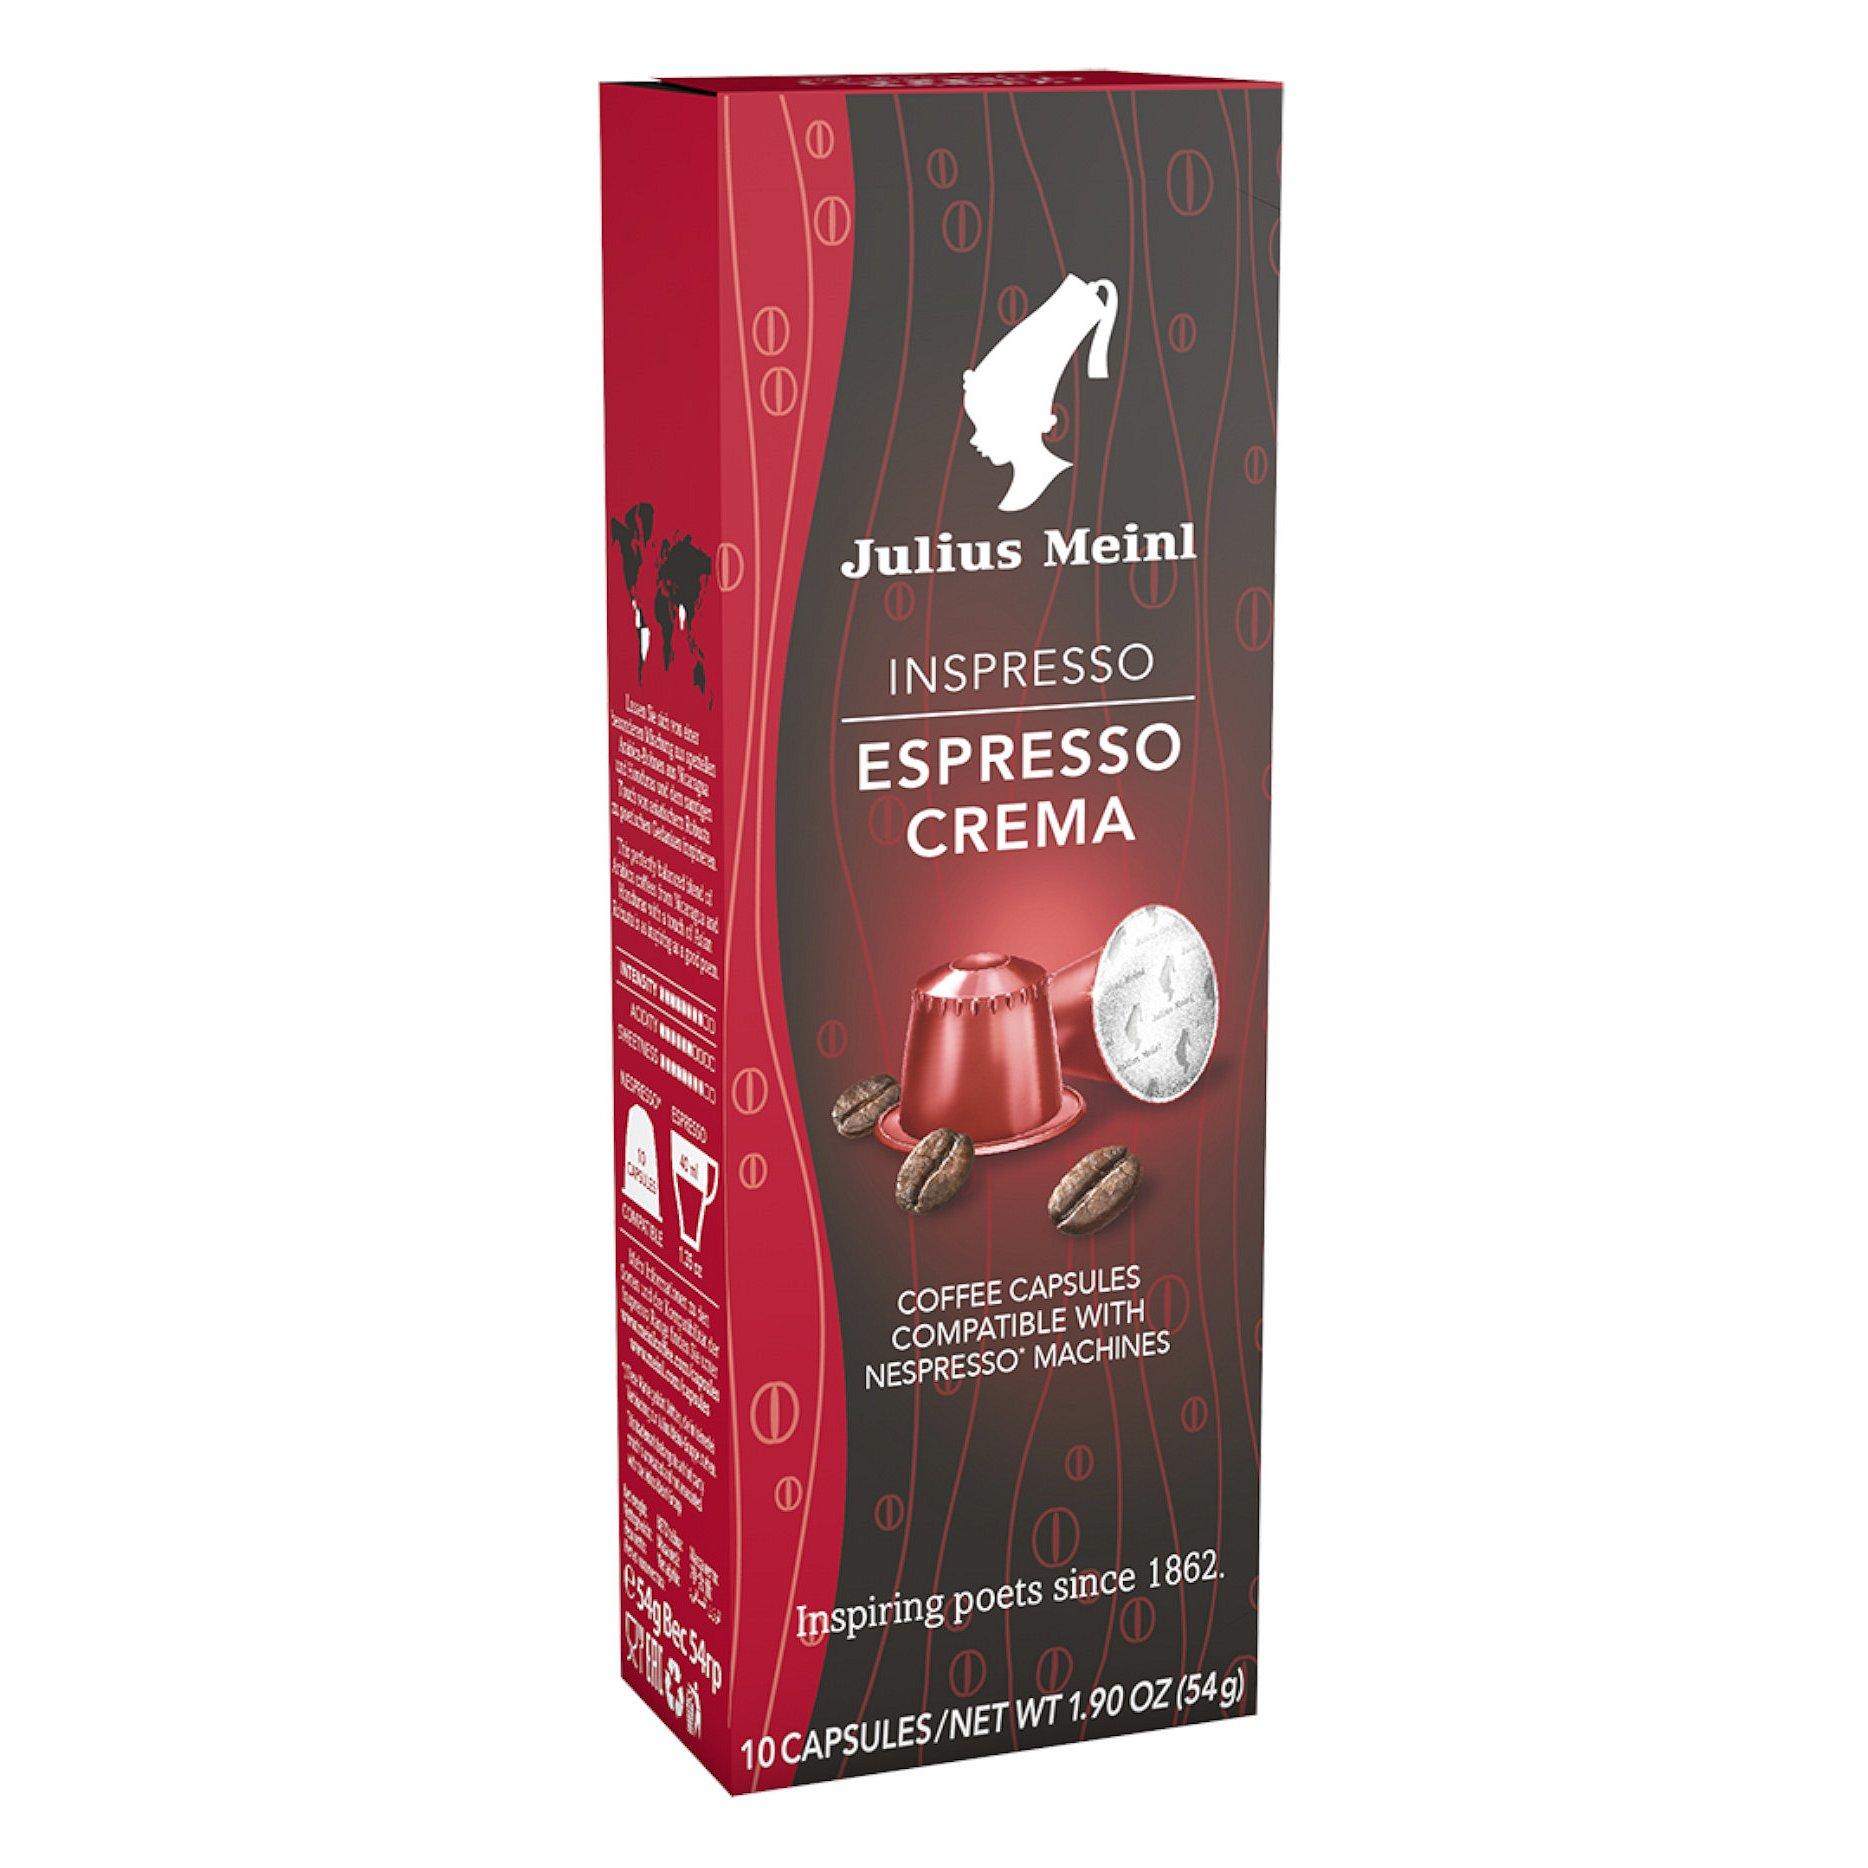 Inspresso Espresso Crema